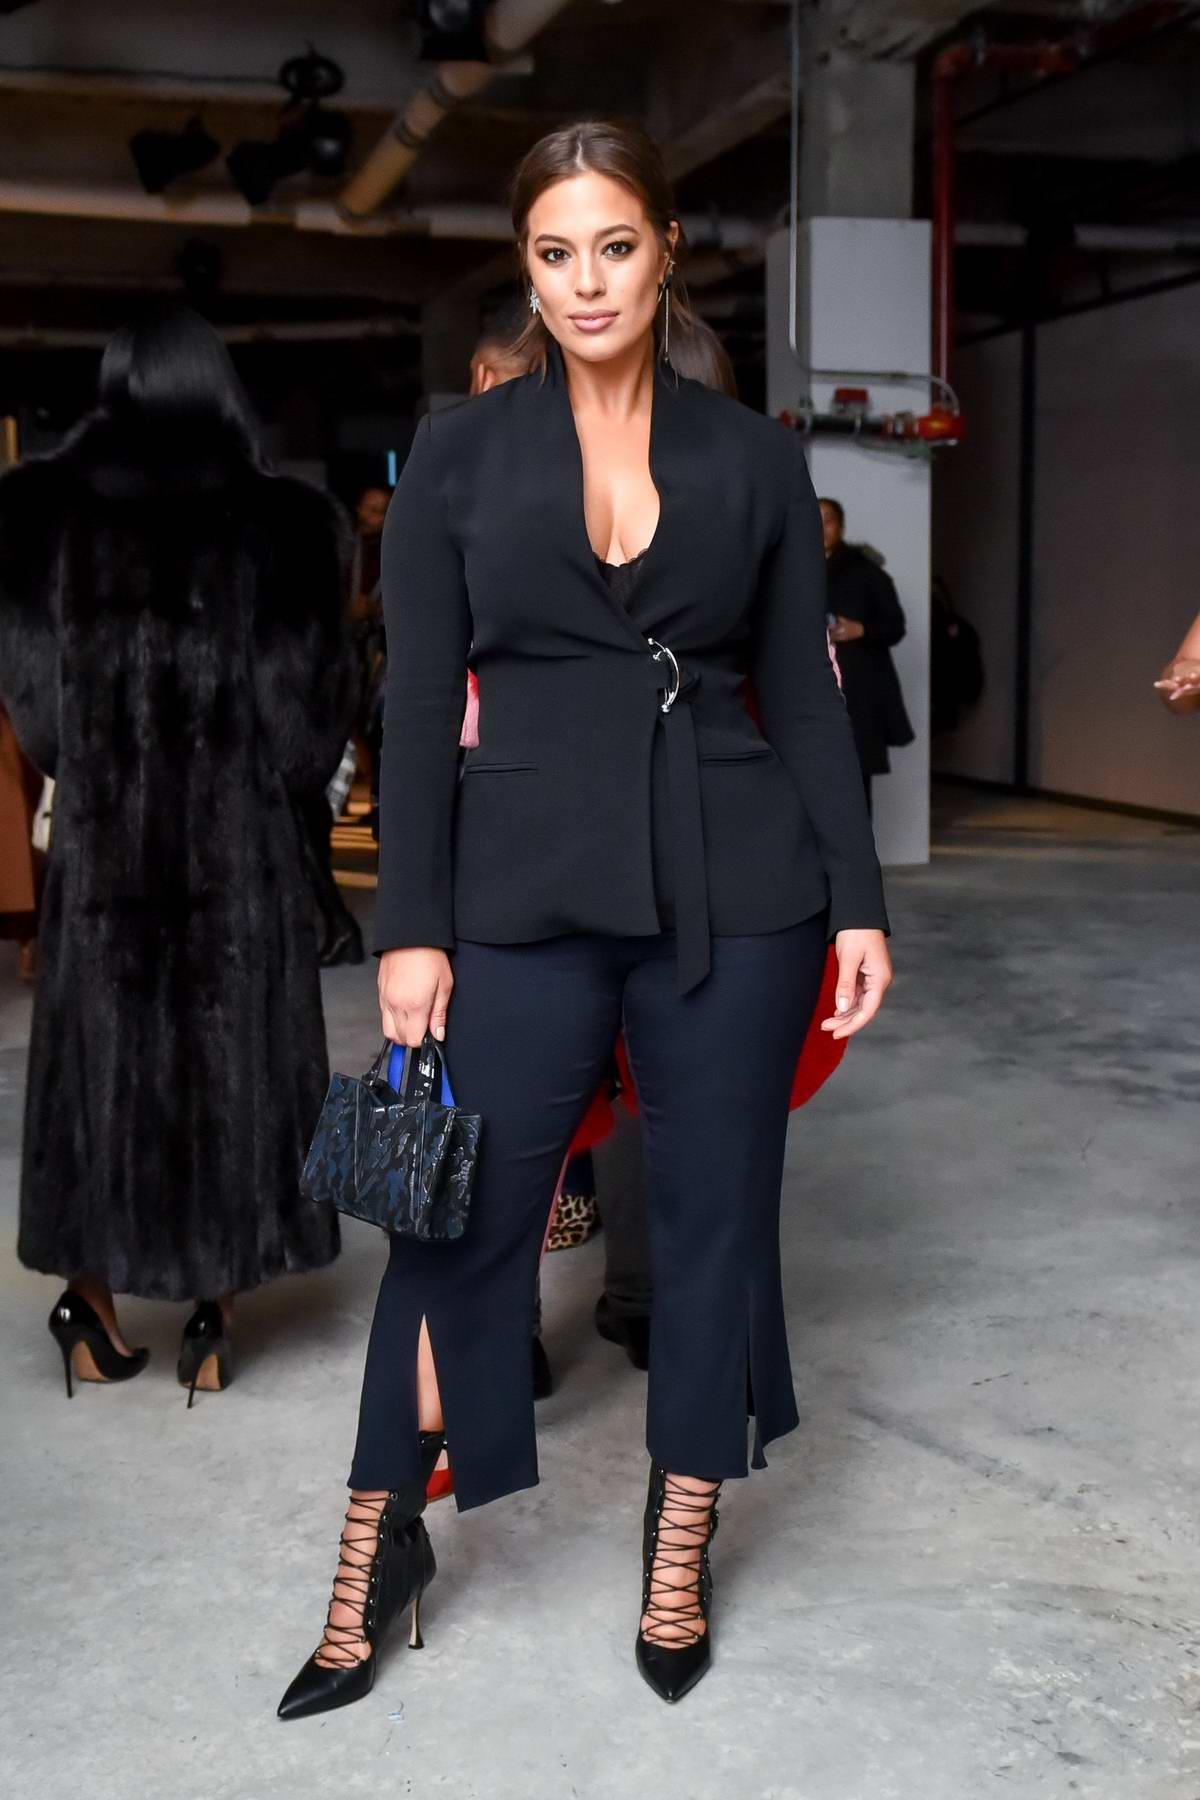 Ashley Graham attends Cushnie Et Ochs Show during New York Fashion Week in New York City